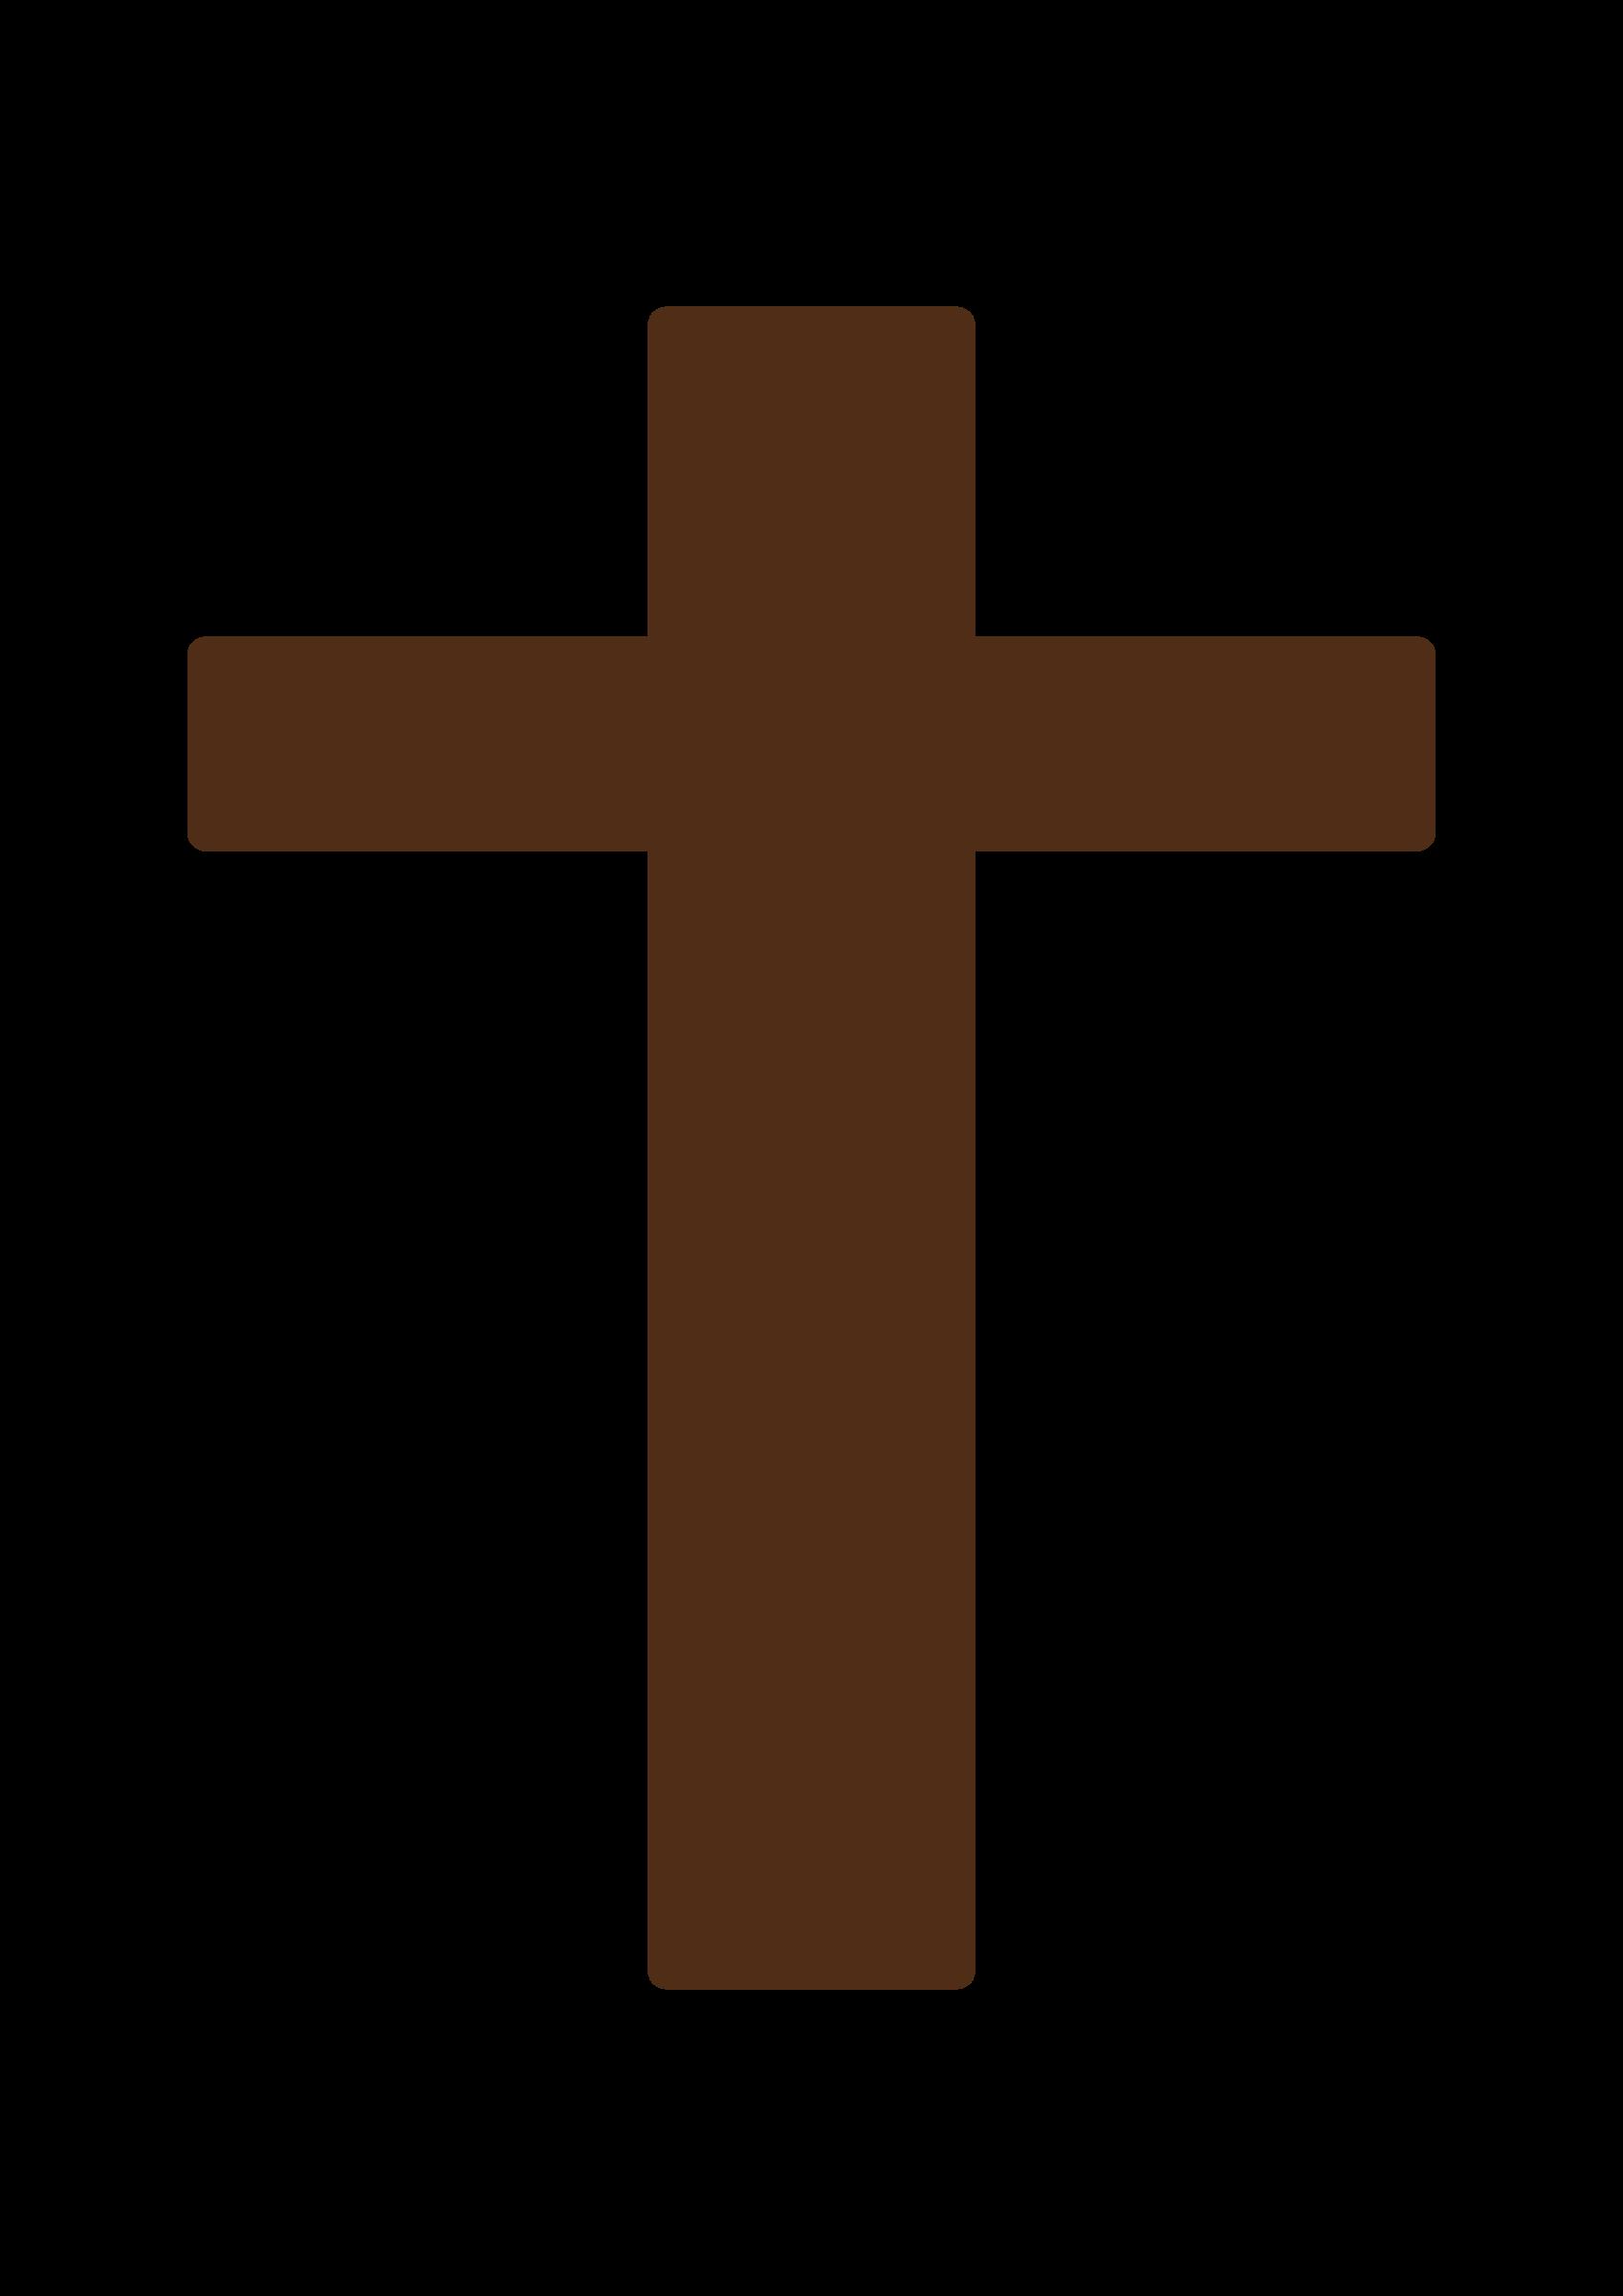 Cristiana big image png. Crucifix clipart cruz